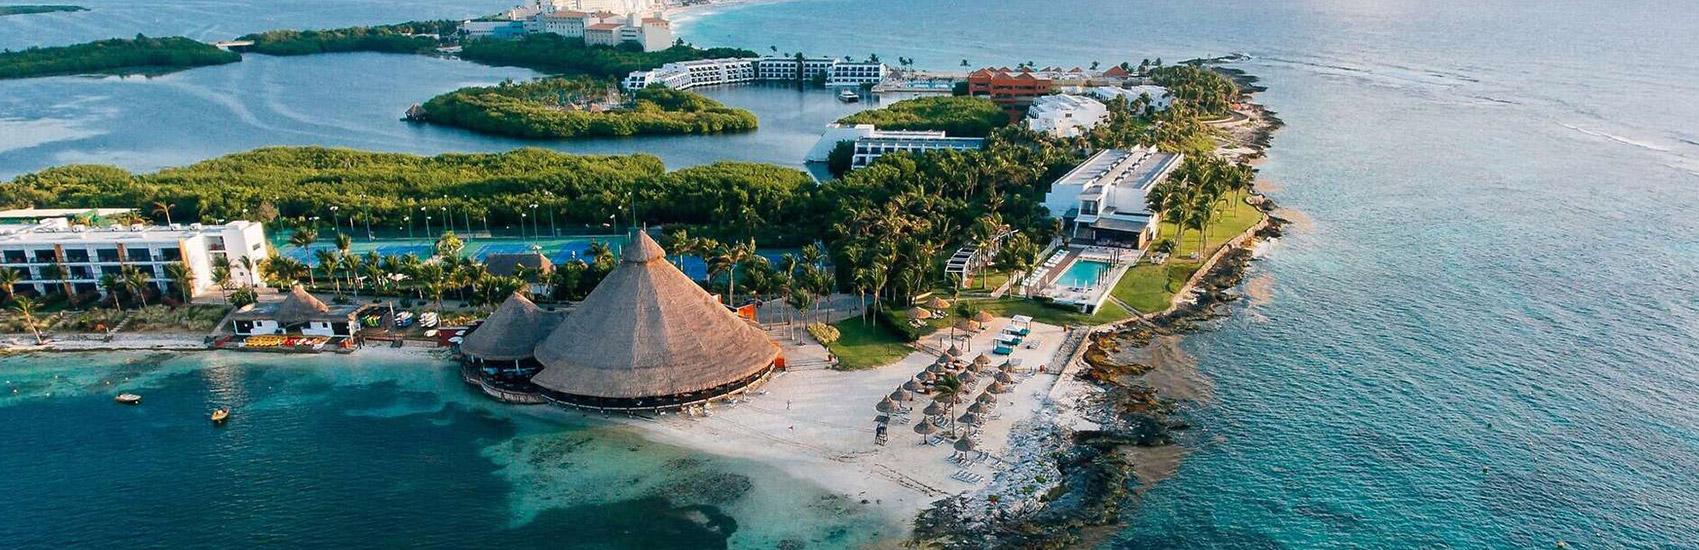 Club Med Early Booking Savings 0